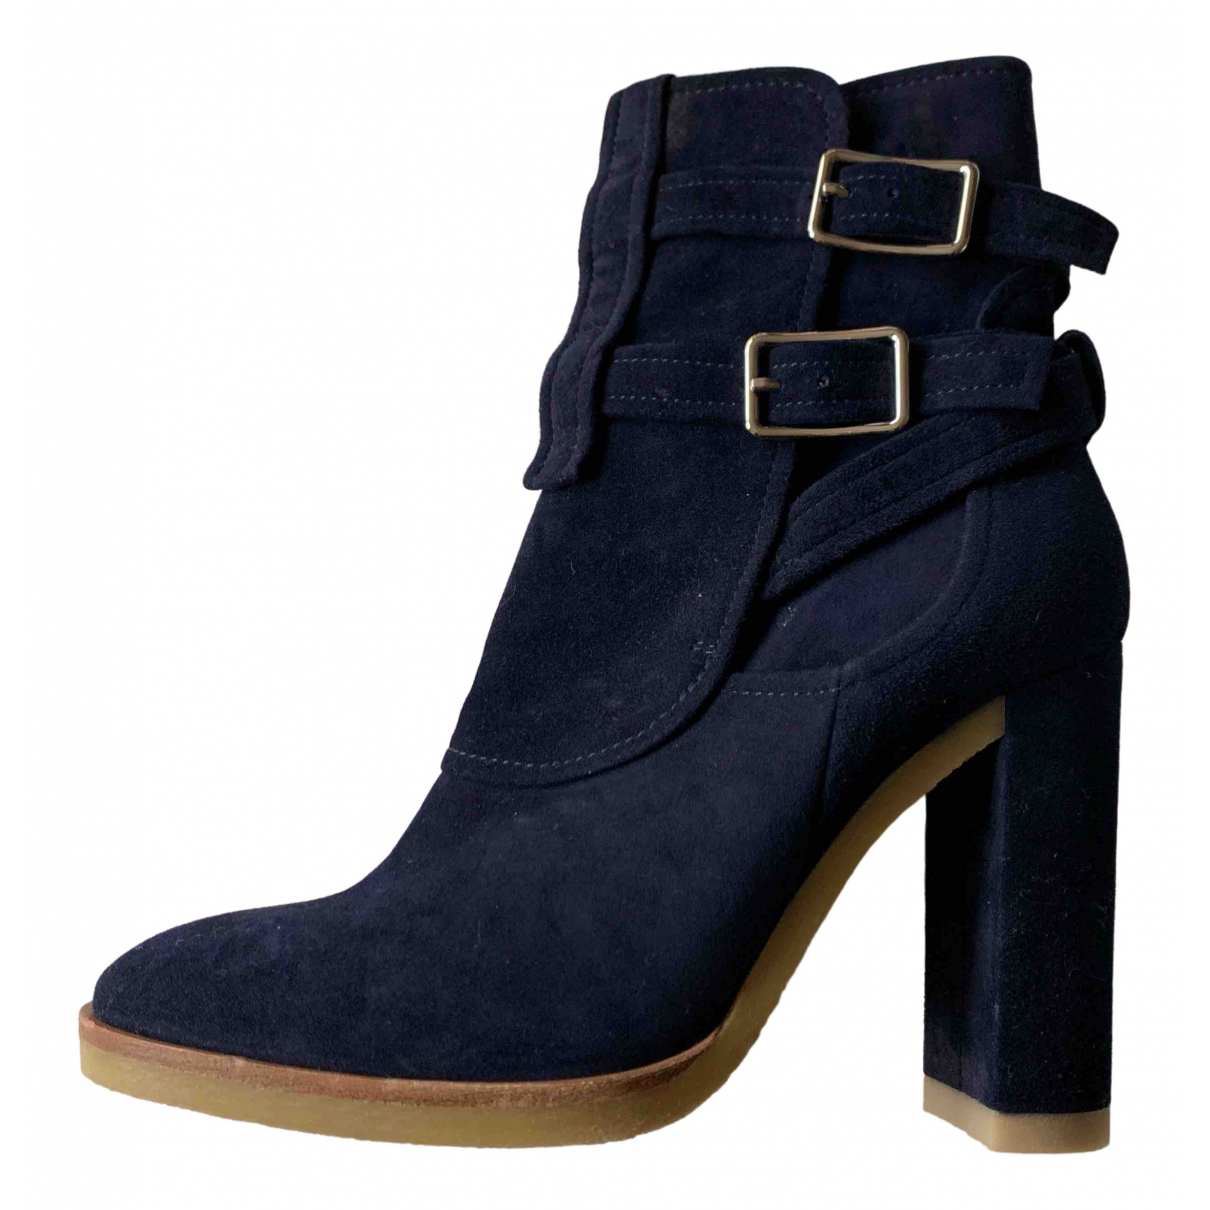 Gianvito Rossi - Boots   pour femme en suede - marine